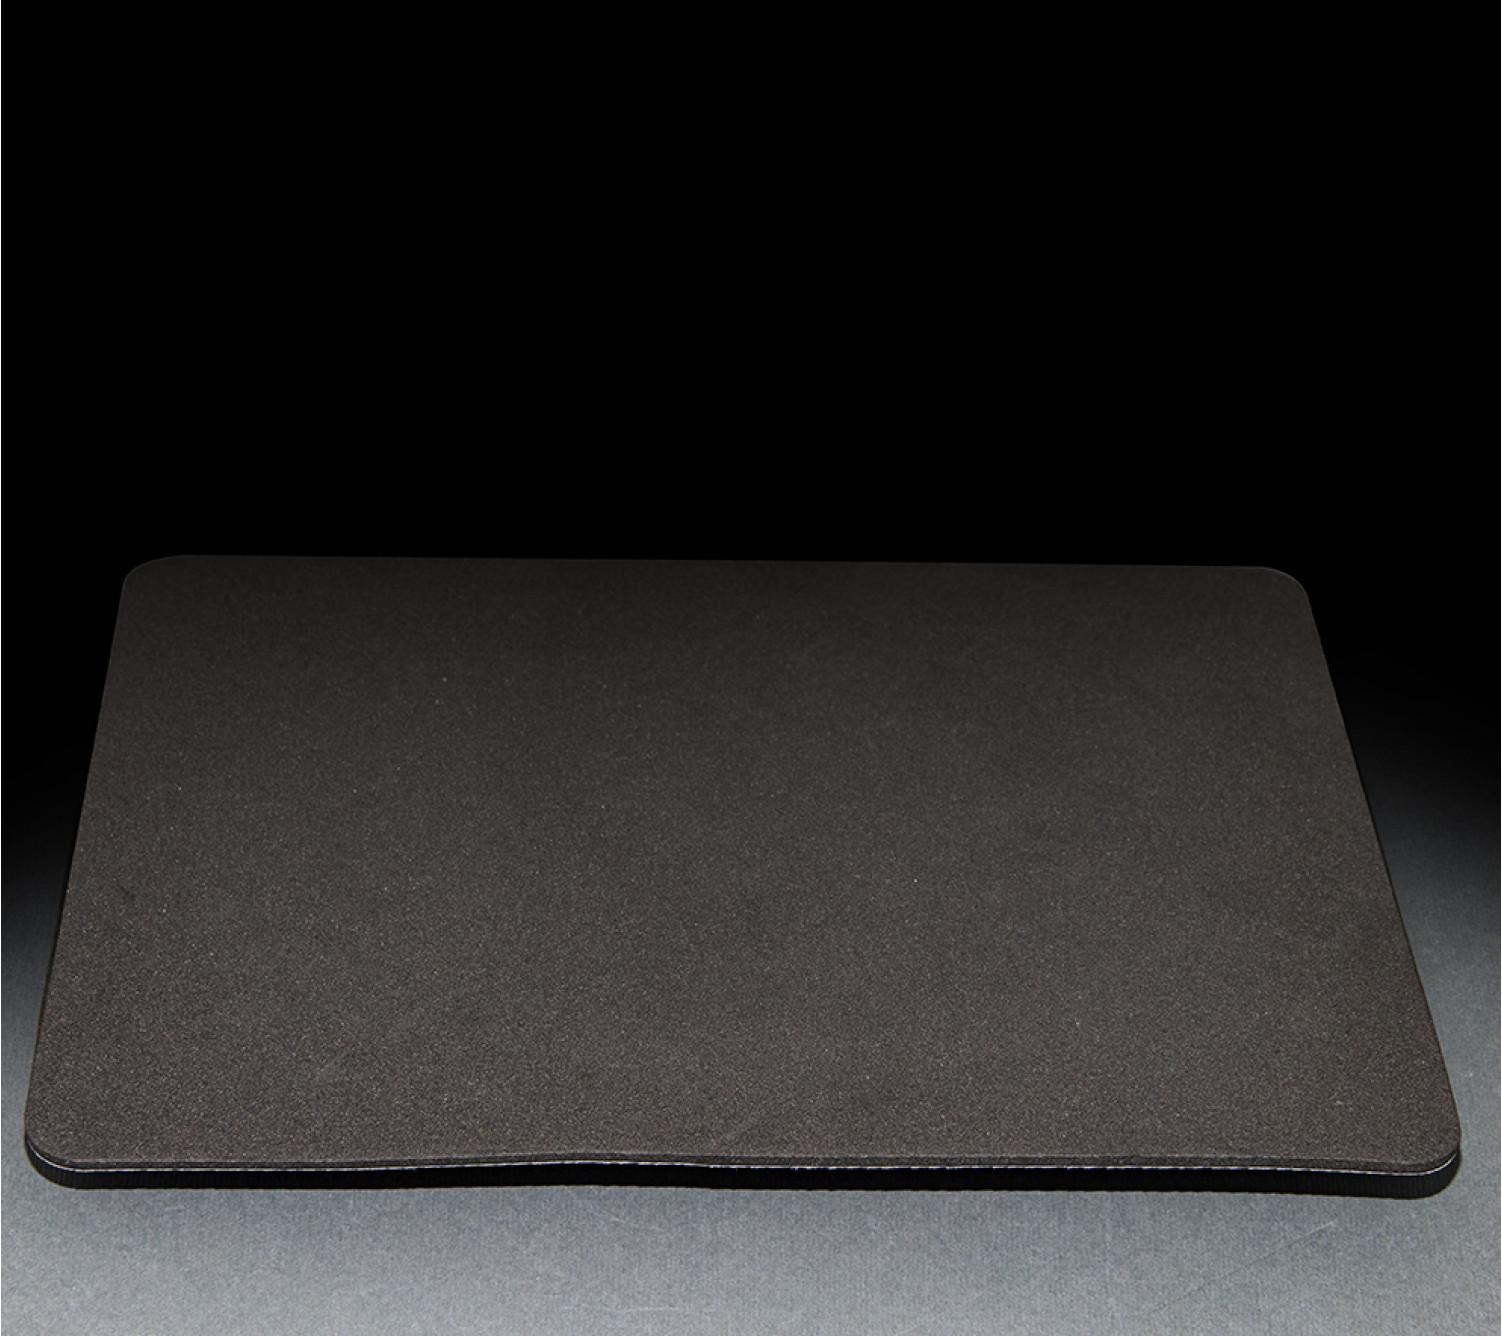 Коврик для мыши Frime MPF-CE-230-01 Black